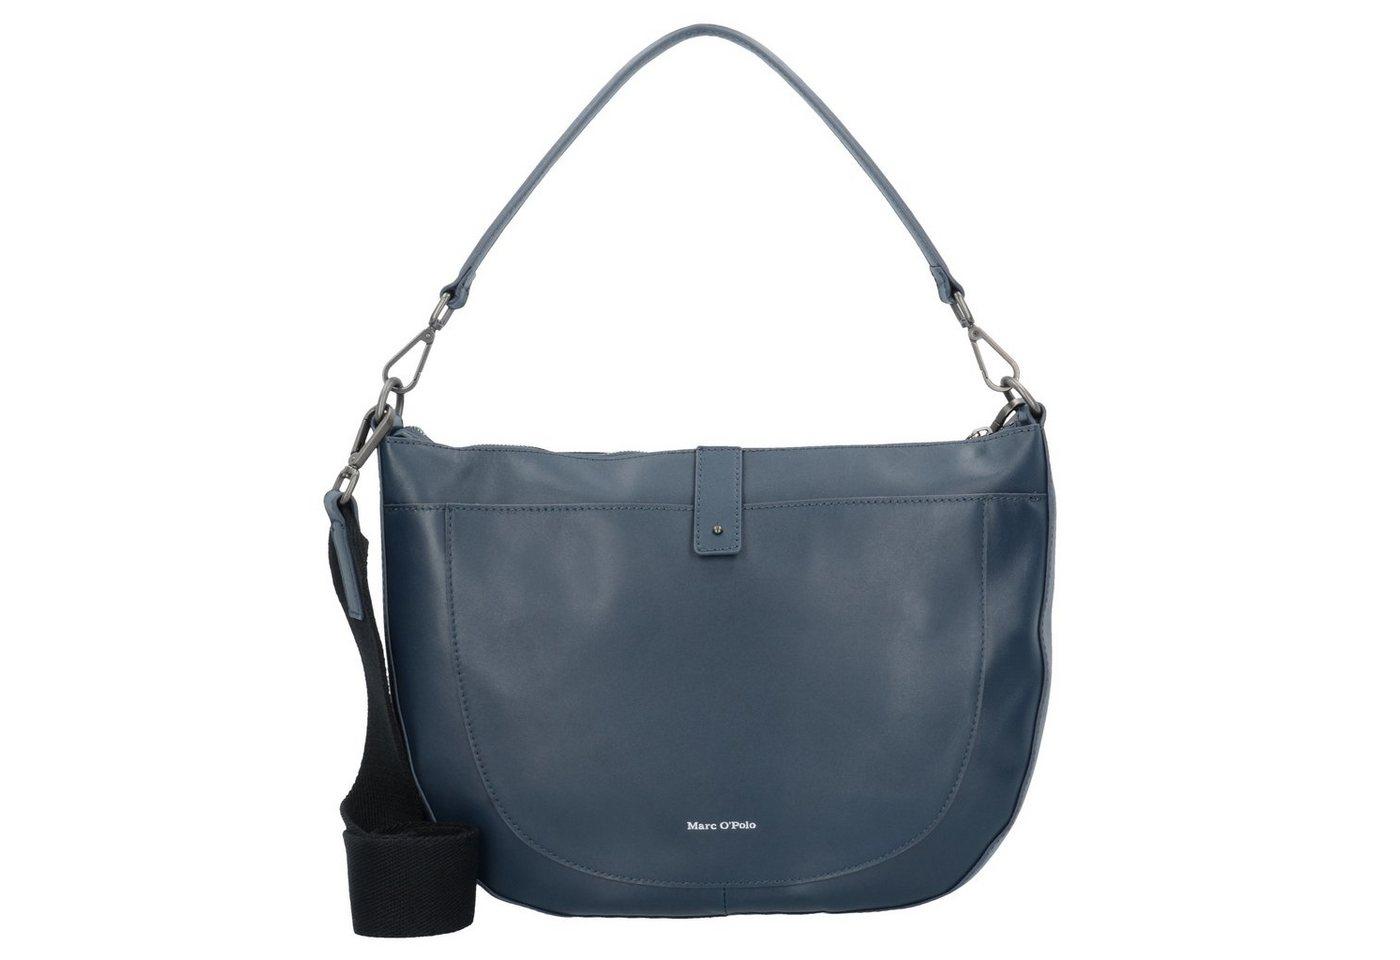 Damen Marc O Polo Eightyfive Schultertasche Leder 35 cm blau | 04059184021314